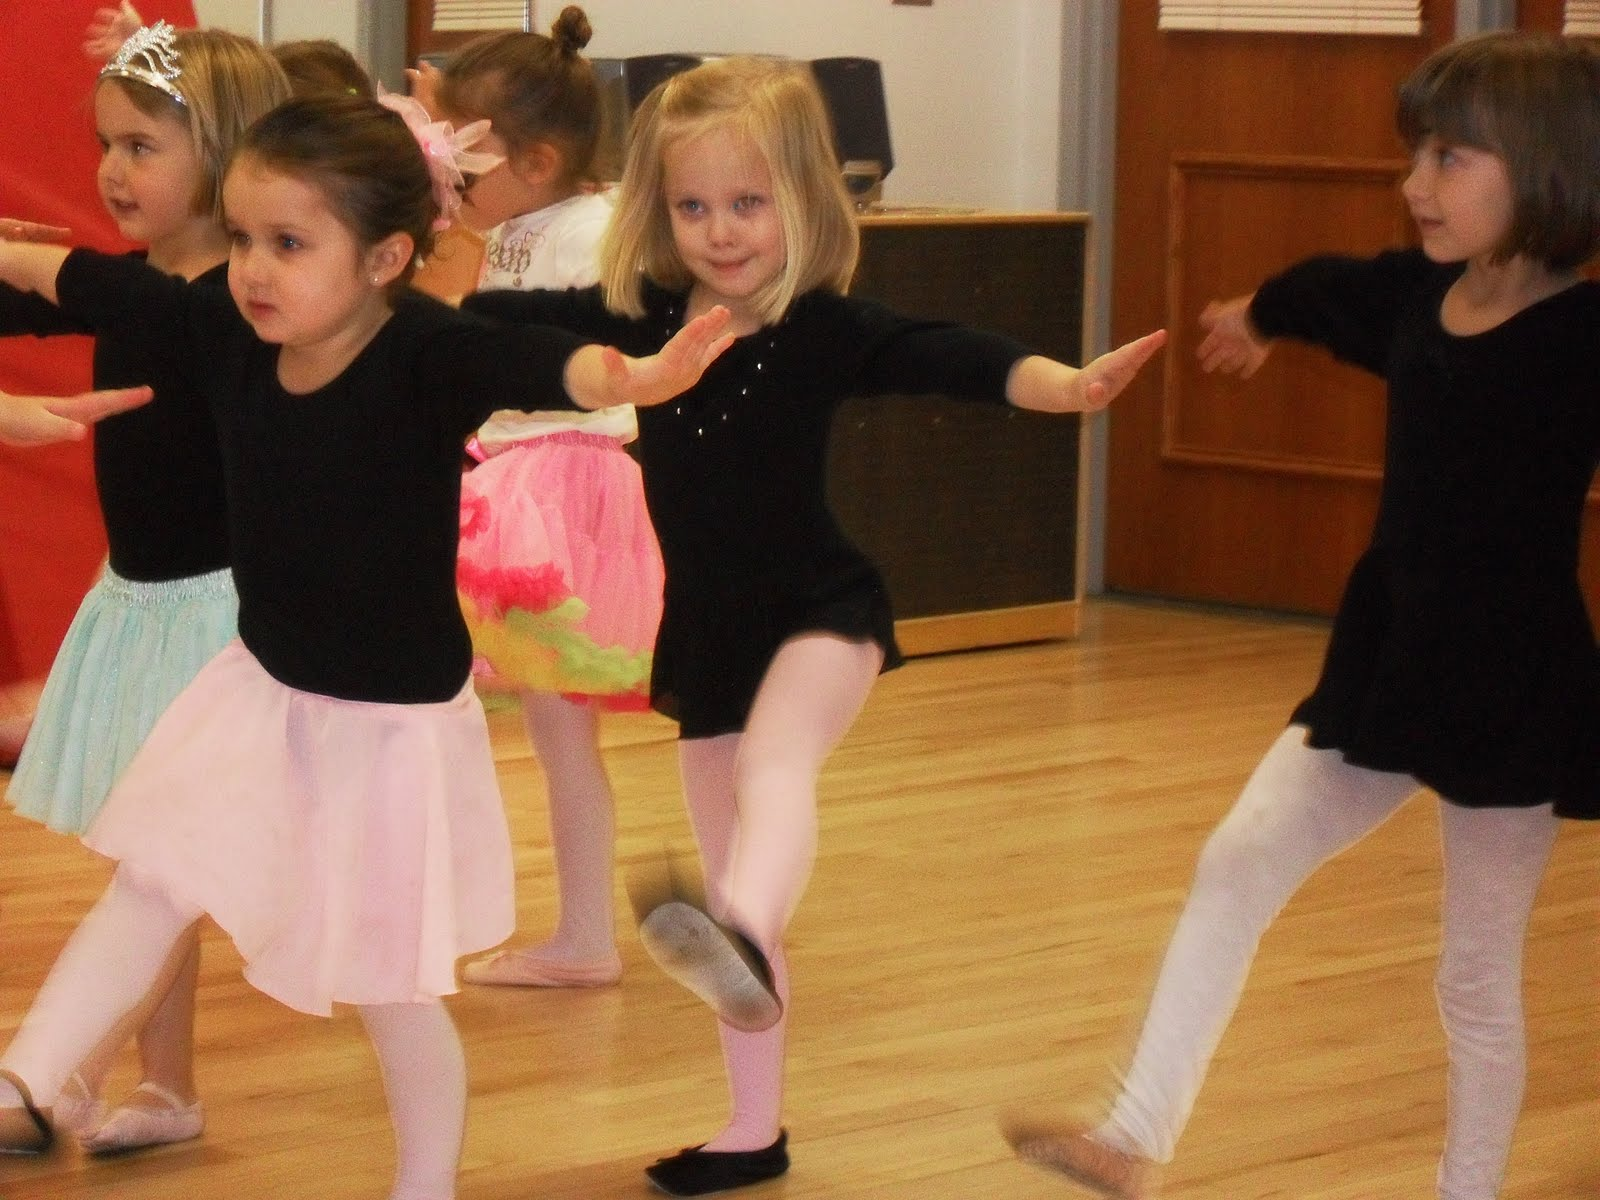 Little Girl Dance - Hot Girls Wallpaper